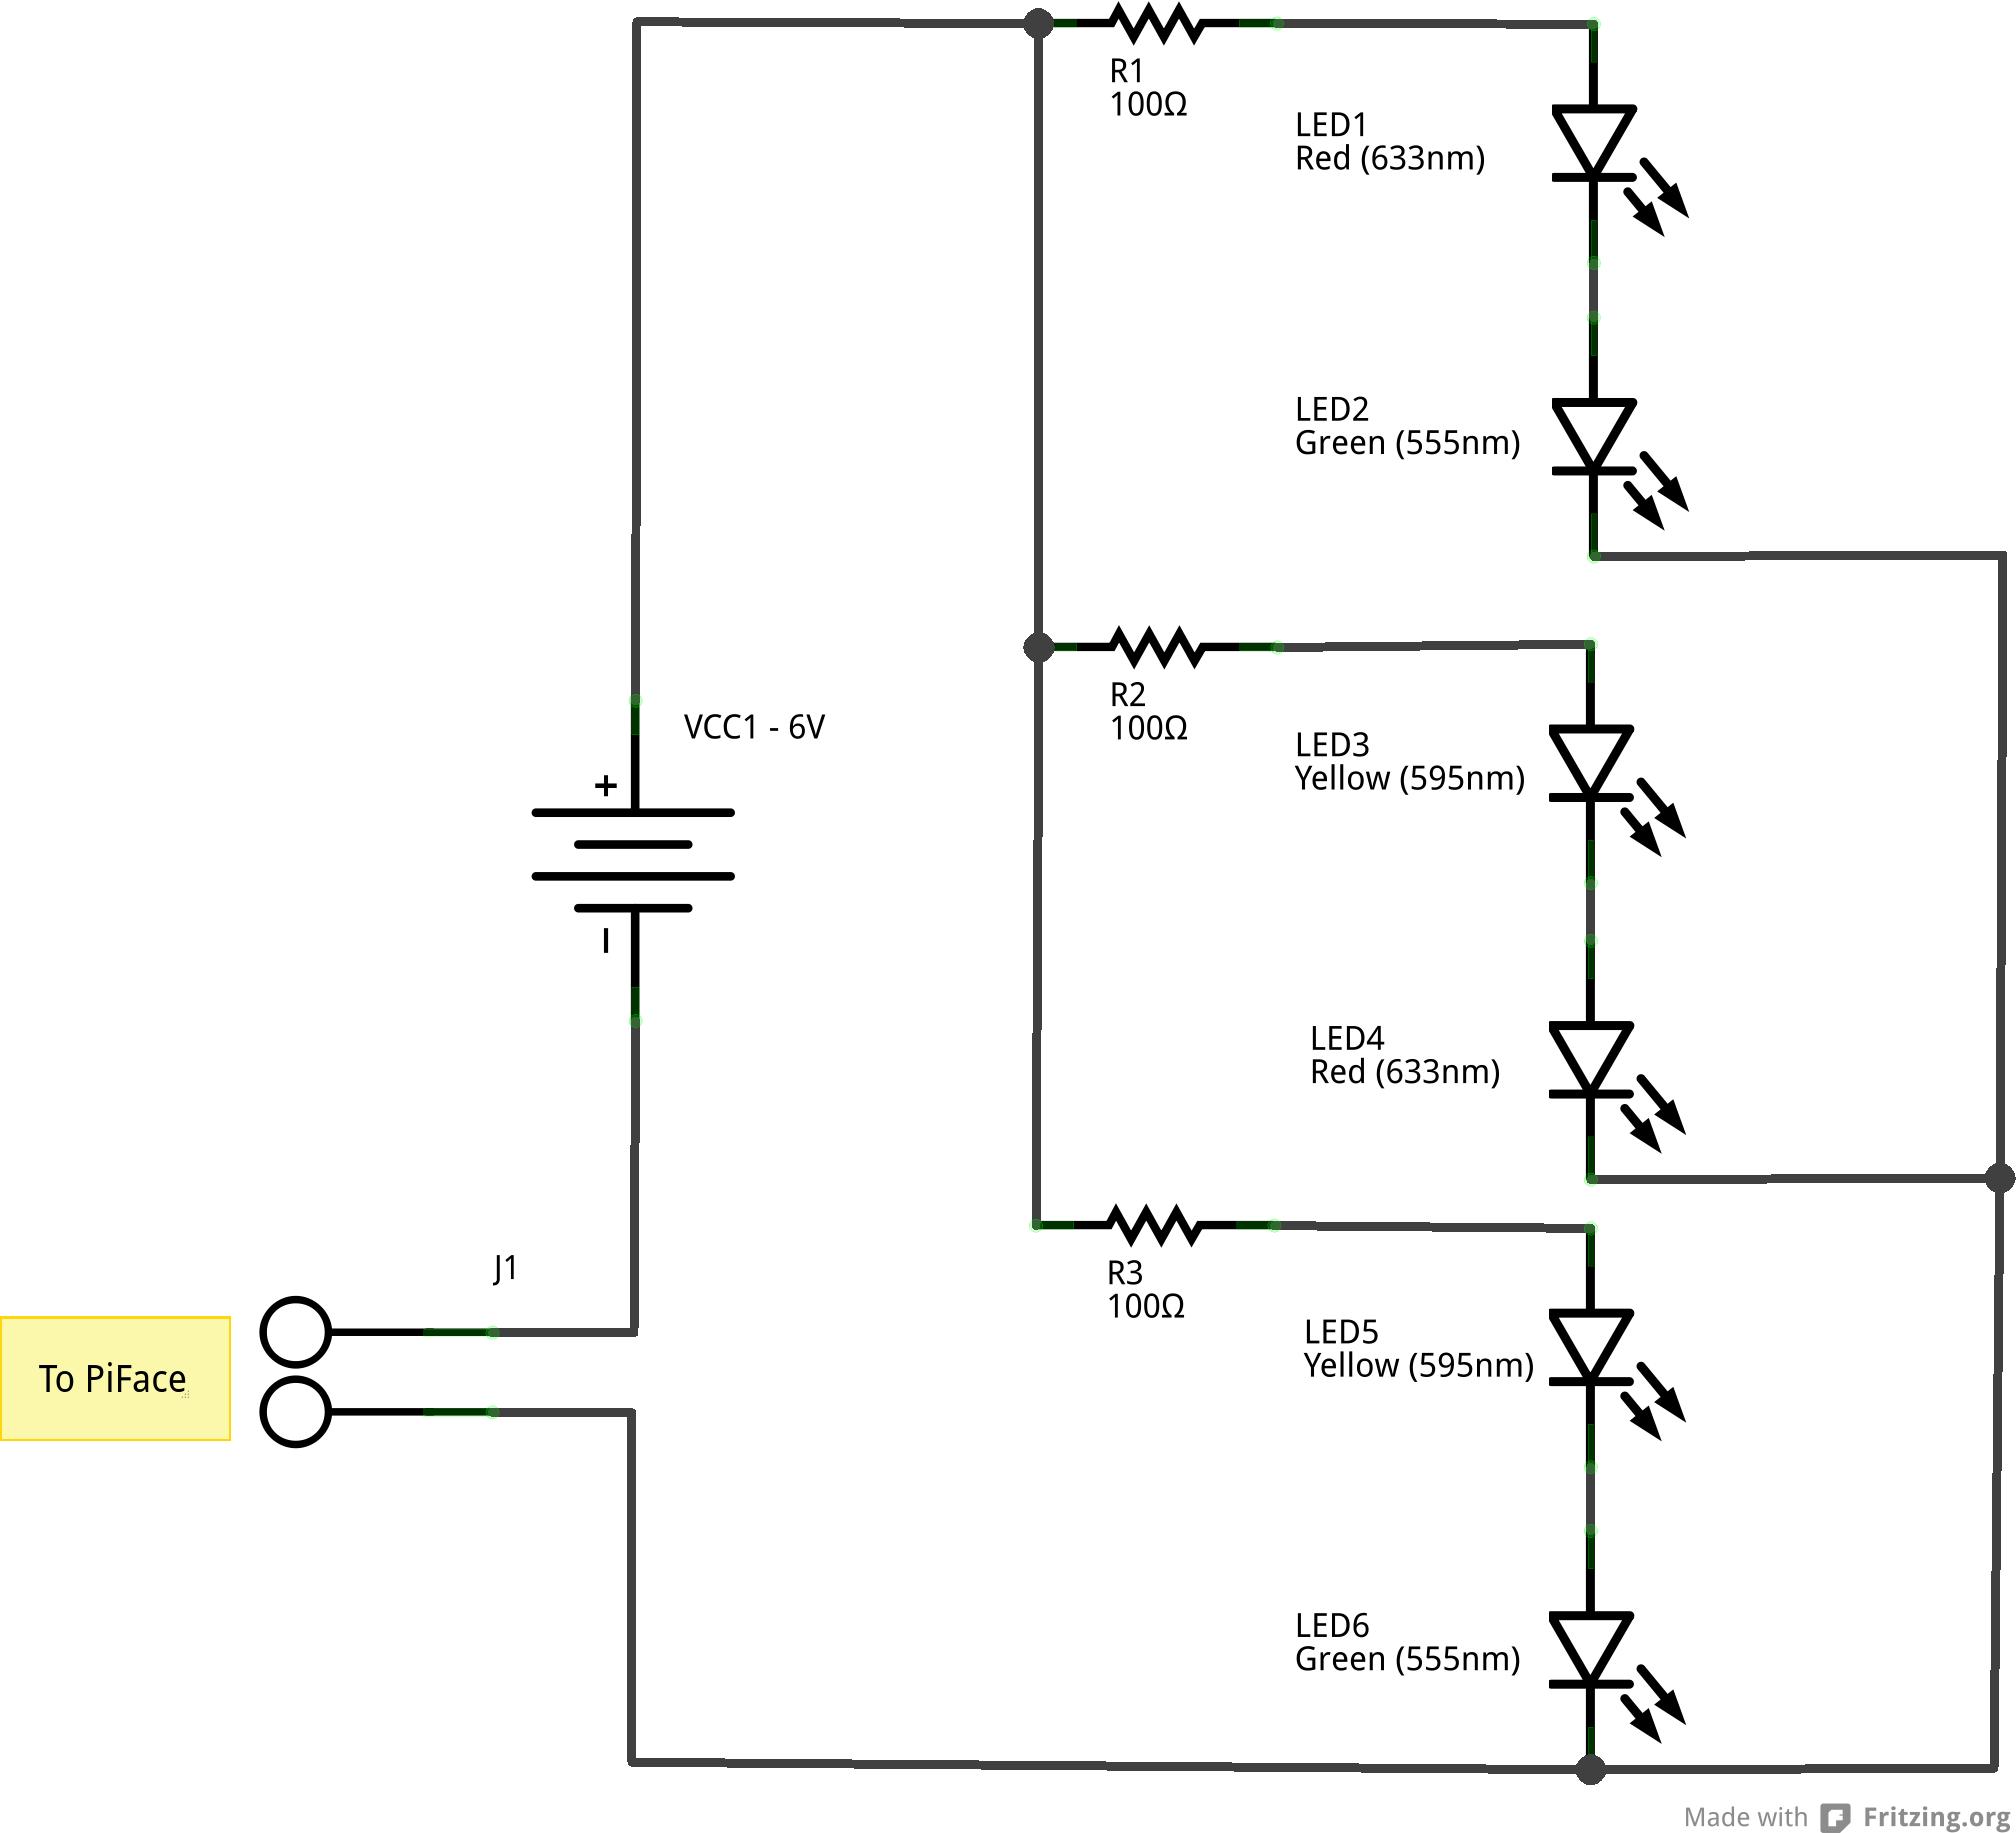 12 volt wiring diagram for lights internal of ceiling fan led strip light free engine